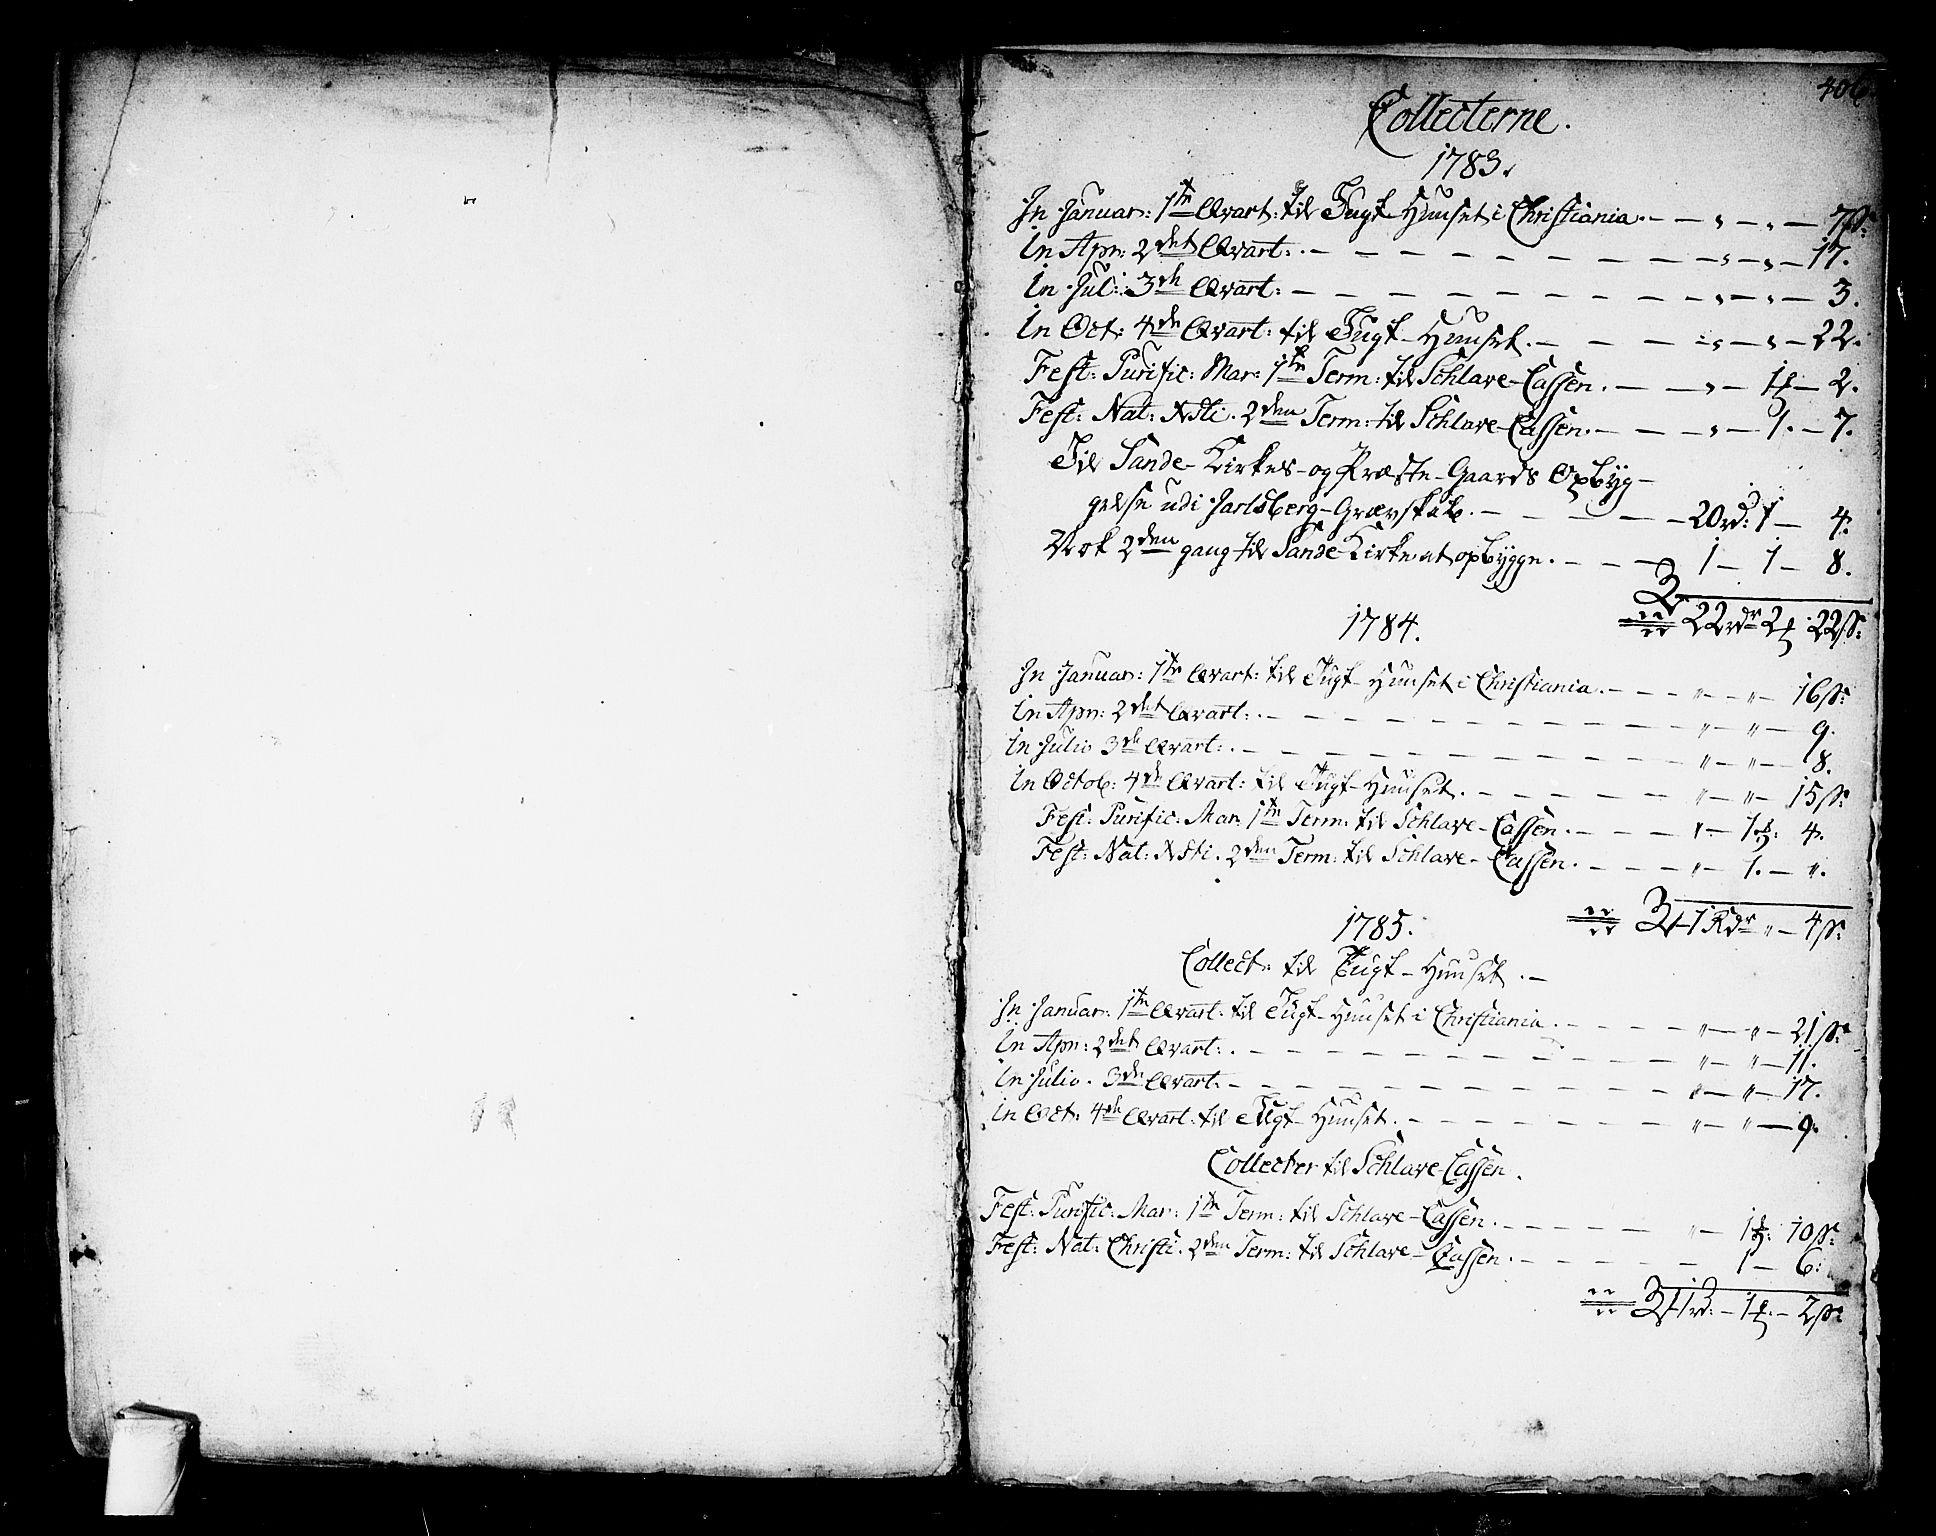 SAKO, Kongsberg kirkebøker, F/Fa/L0006: Parish register (official) no. I 6, 1783-1797, p. 406